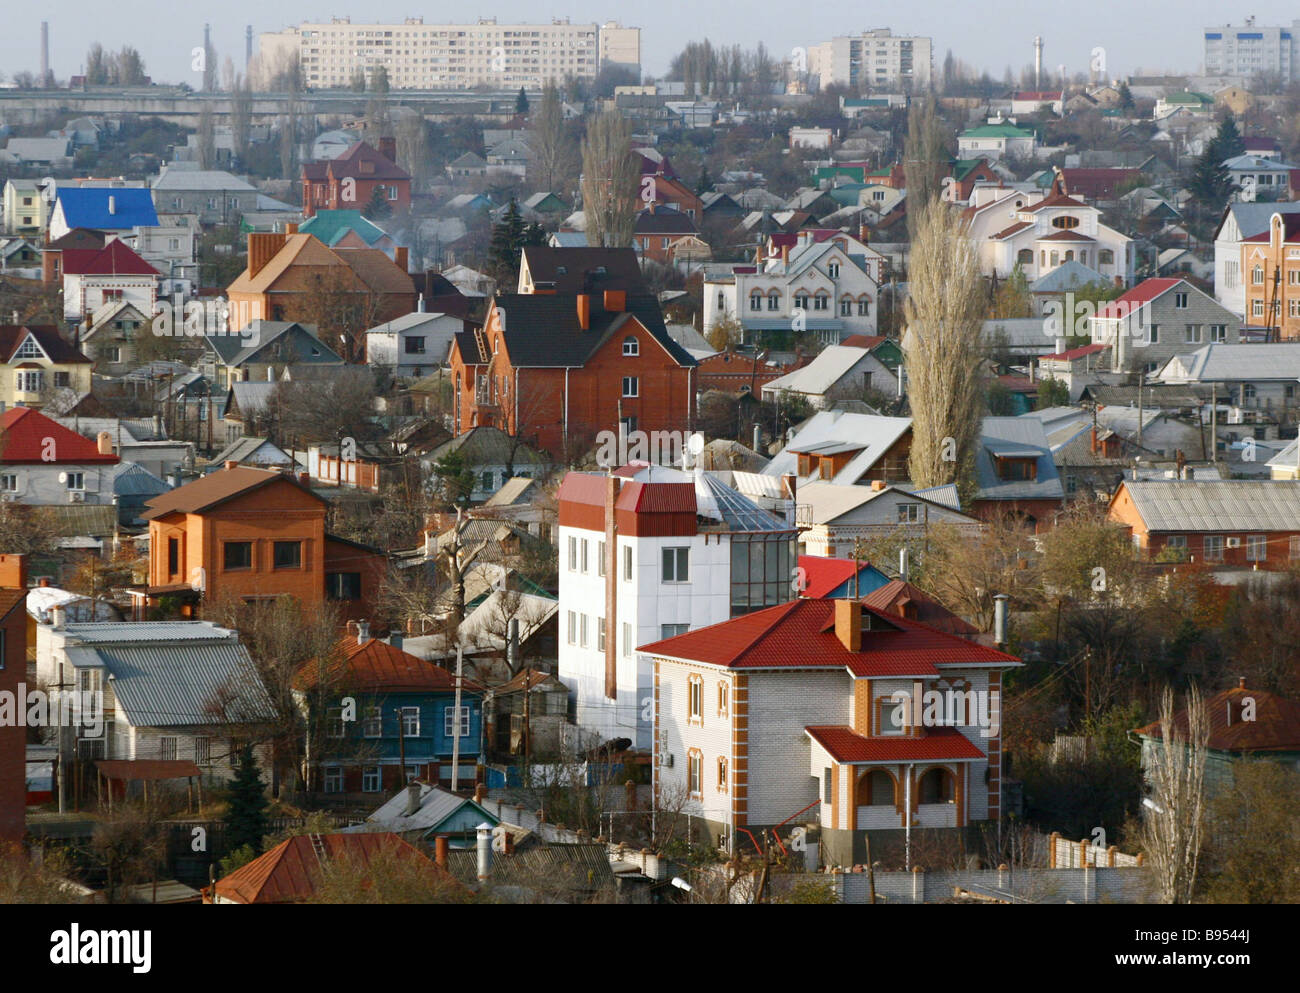 Private homes in Volgograd - Stock Image